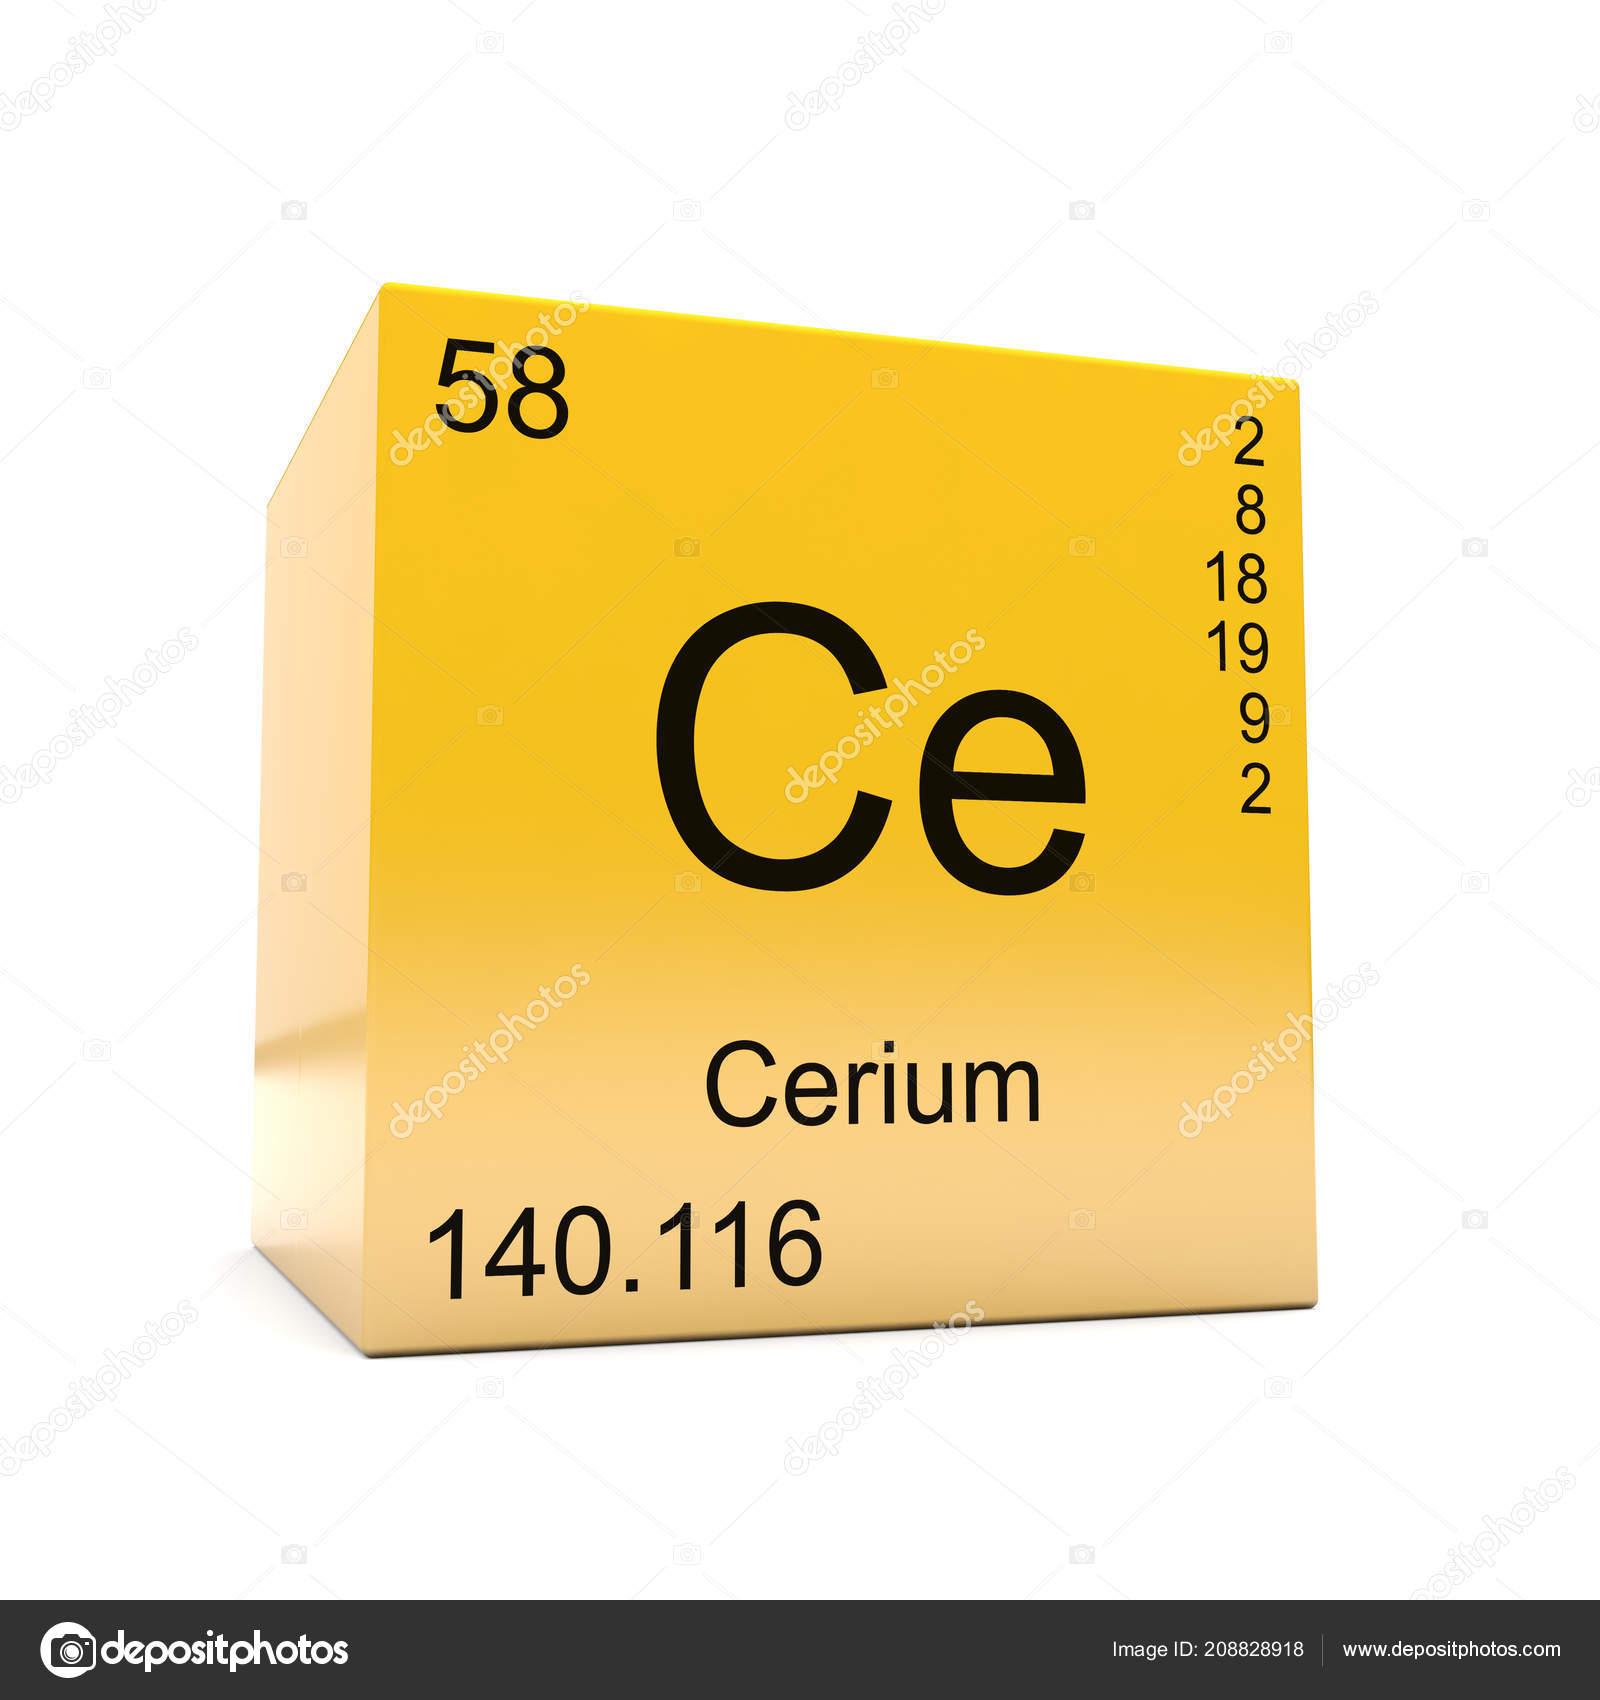 Cerium chemical element symbol periodic table displayed glossy cerium chemical element symbol from the periodic table displayed on glossy yellow cube photo by conceptw urtaz Images